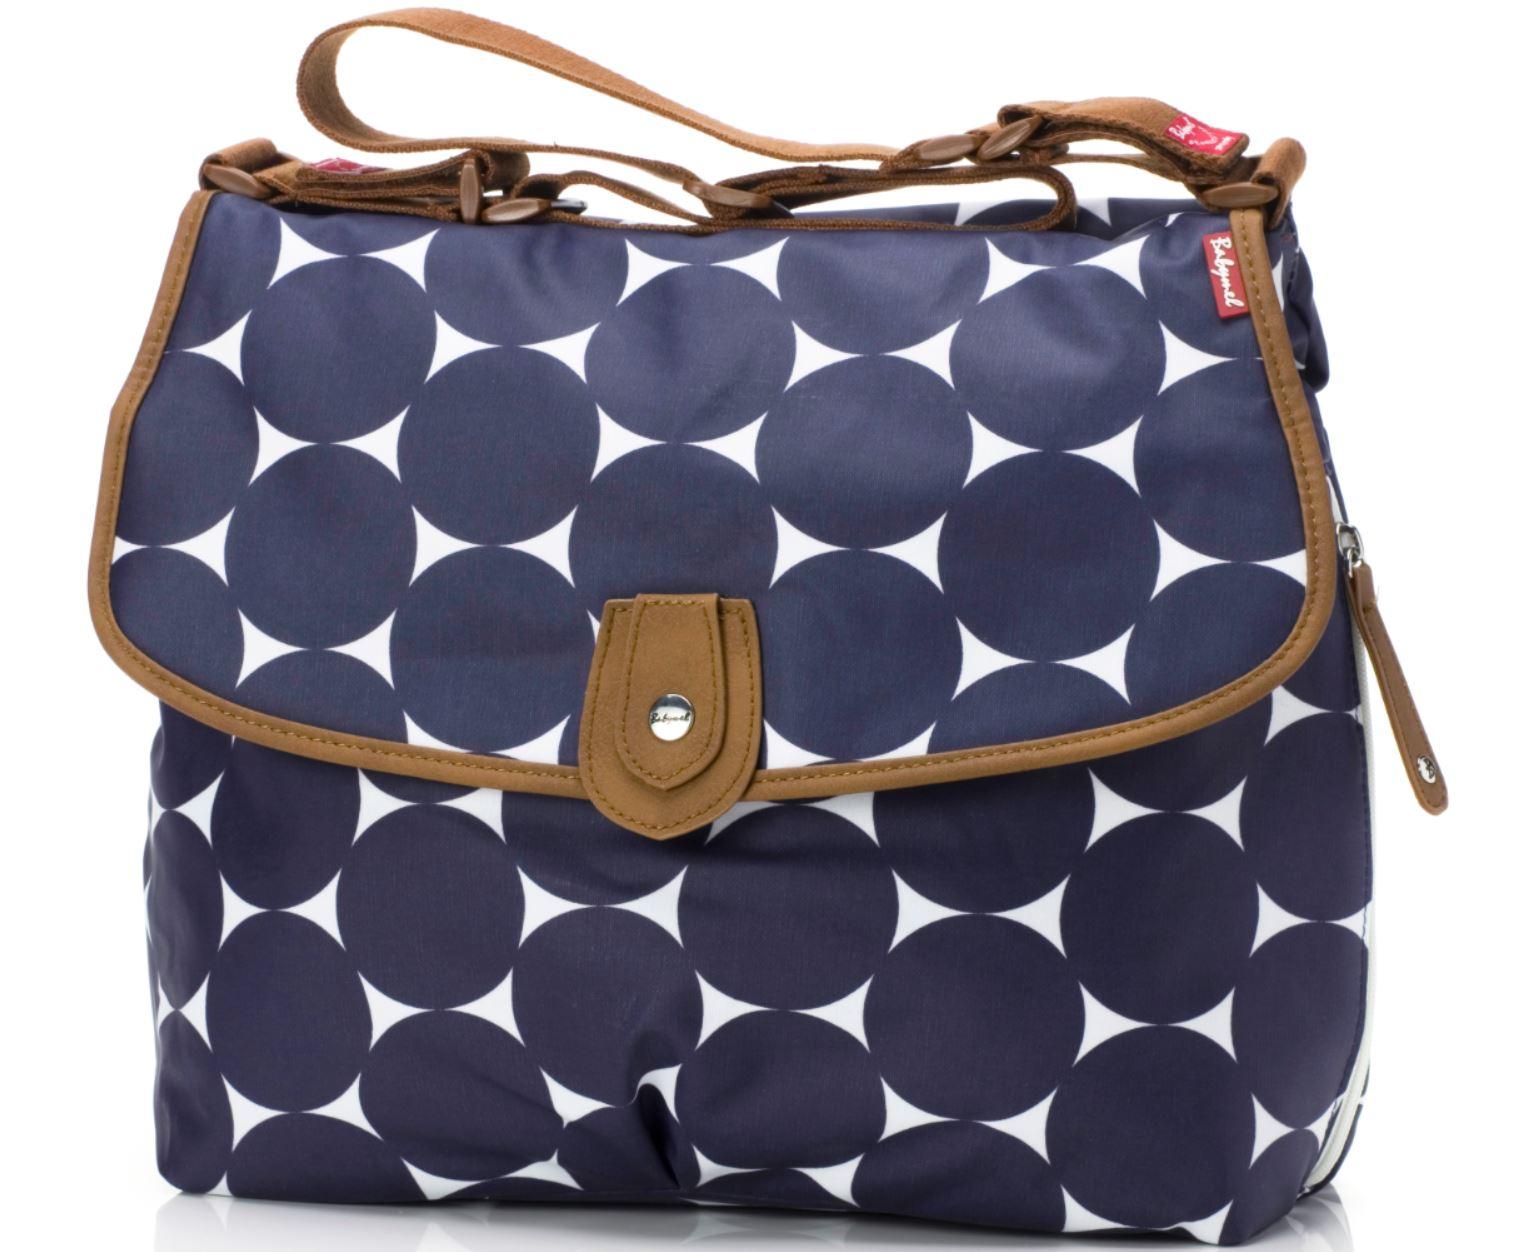 wickeltasche satchel von babymel jumbo dot navy wickeltaschen. Black Bedroom Furniture Sets. Home Design Ideas